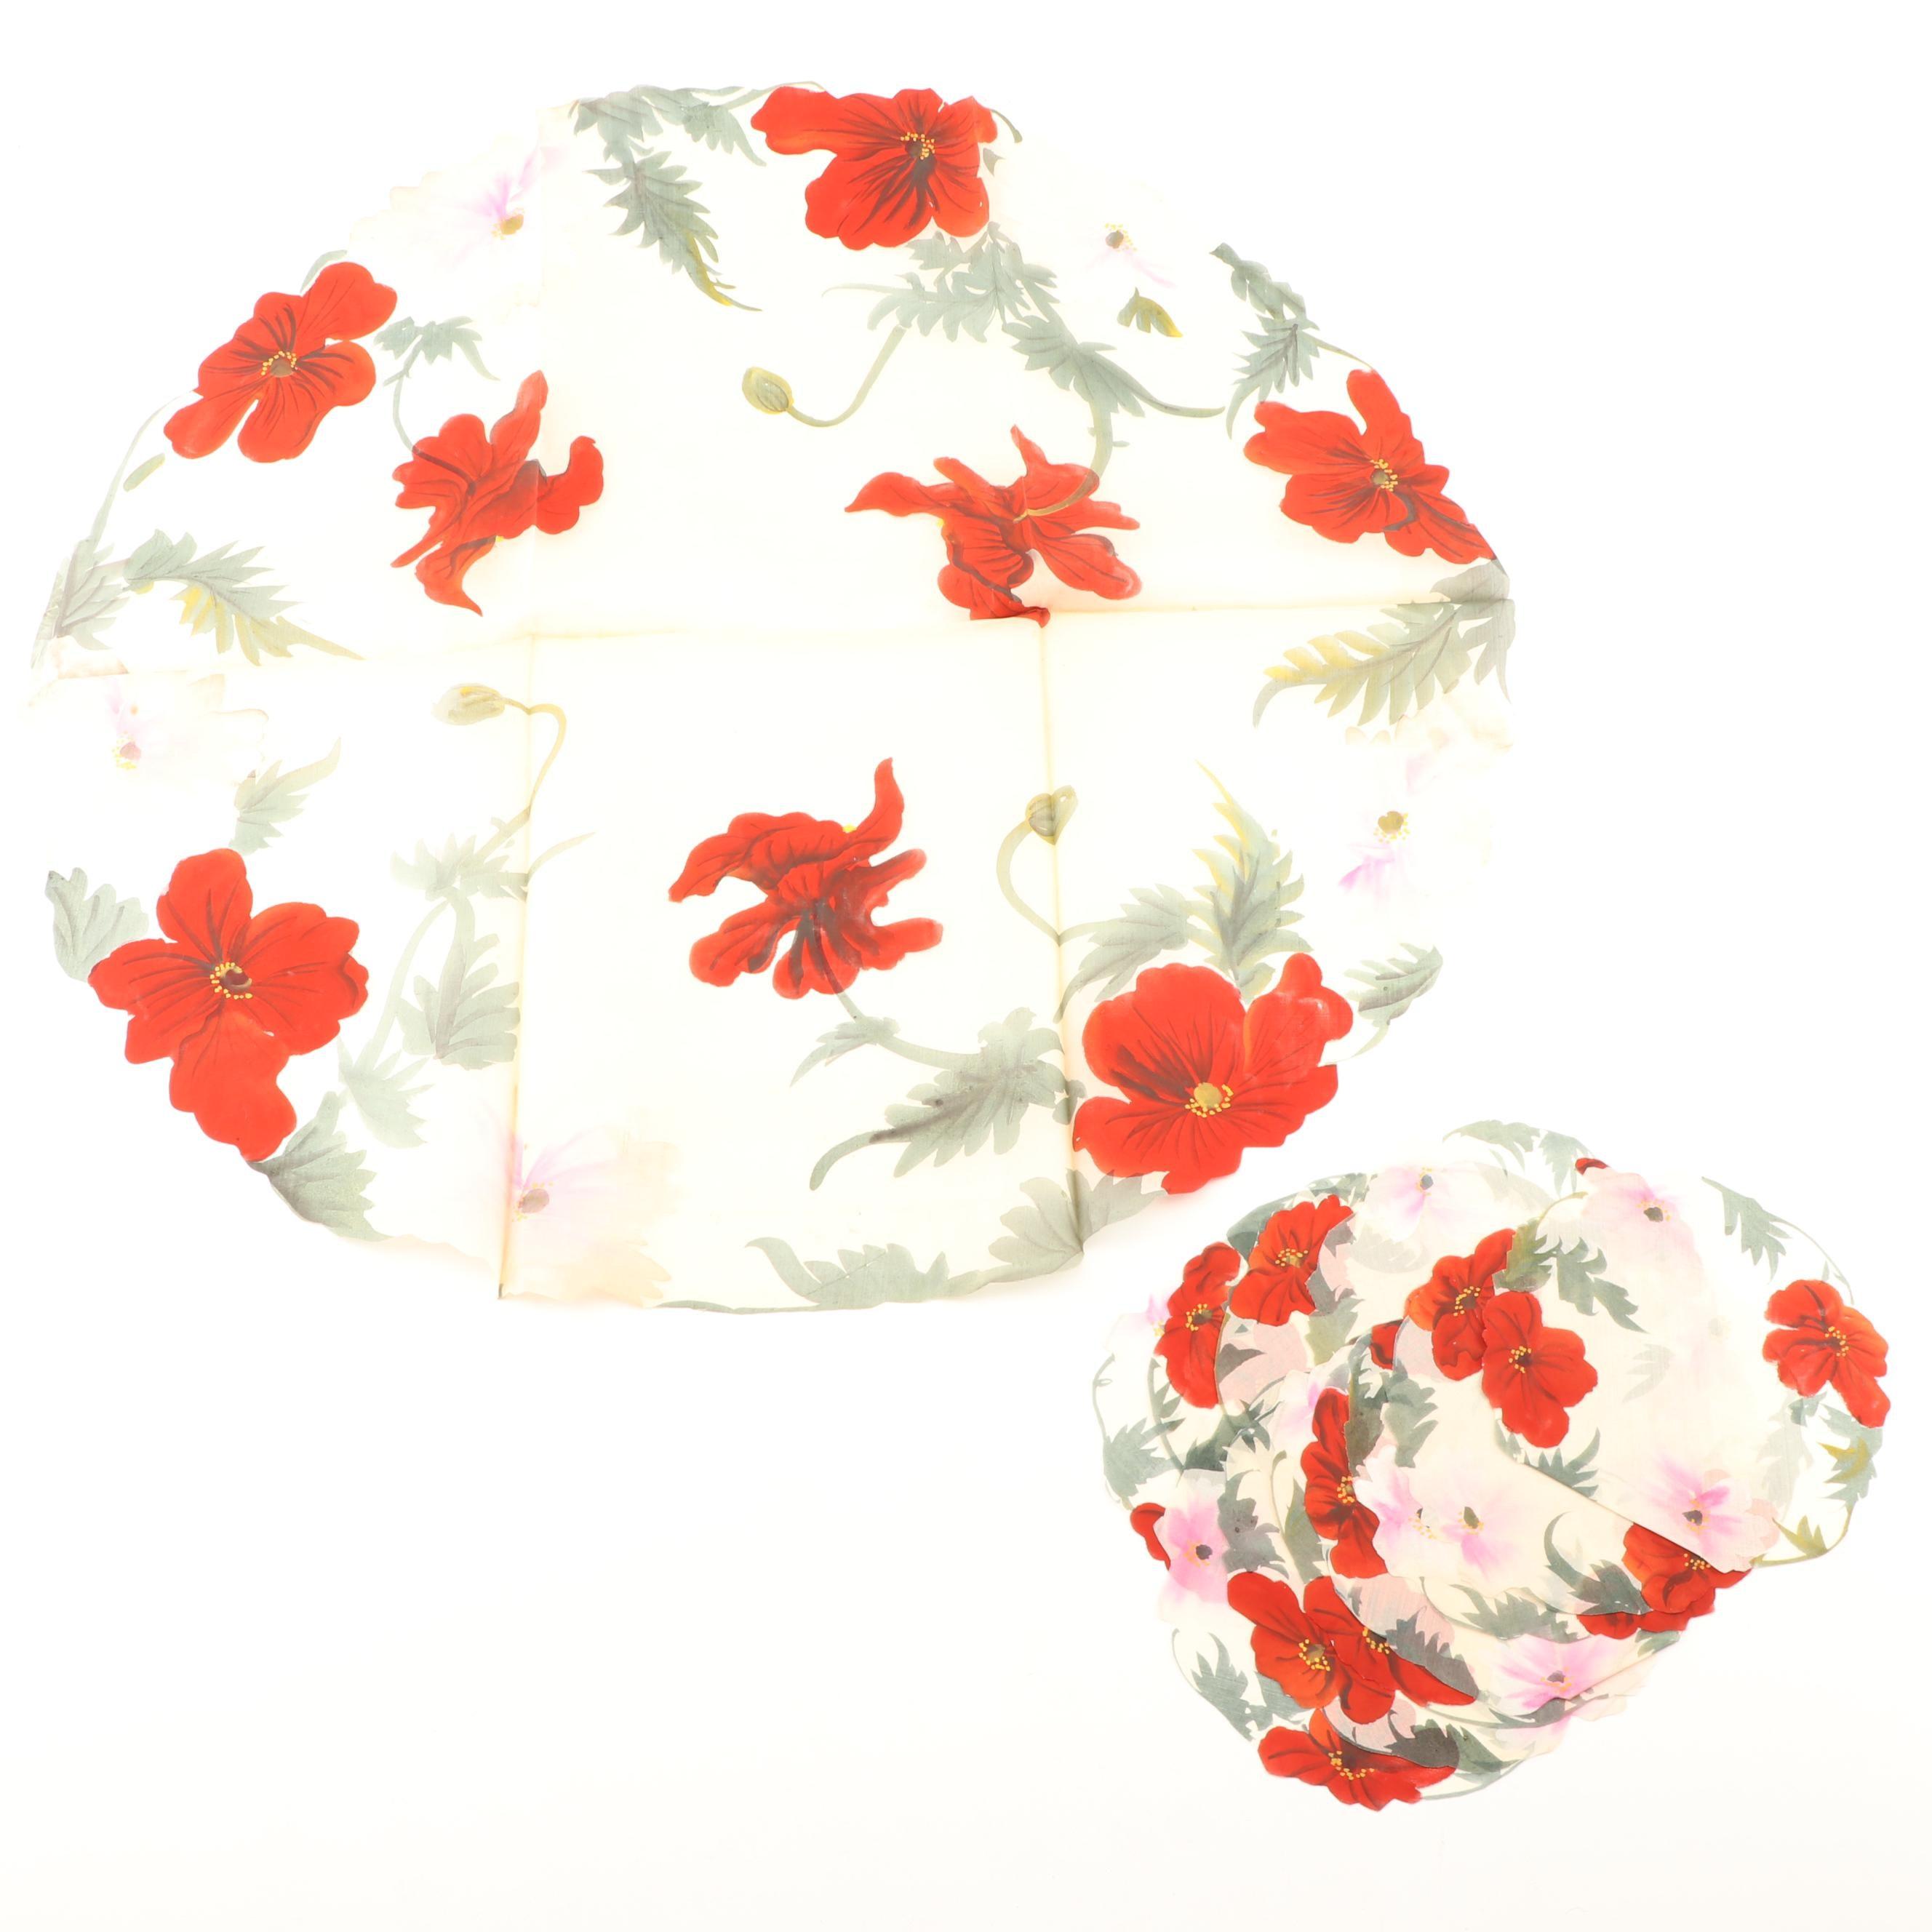 Portfolio of Floral Gouache Paintings on Silk